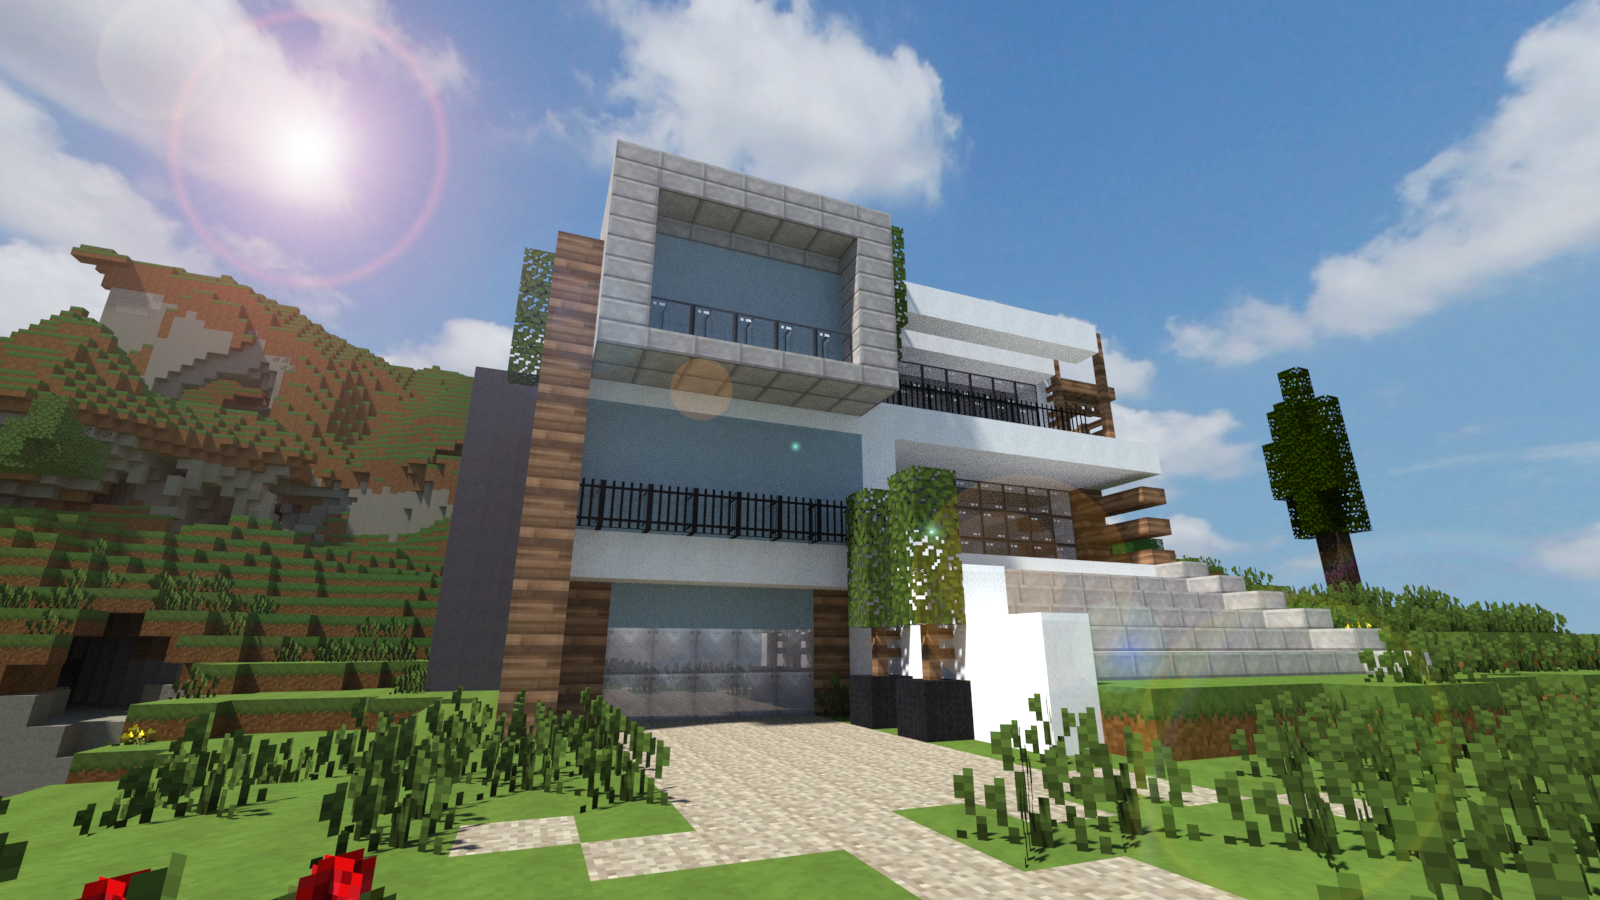 Modern House Render 3 by andrewvtw on DeviantArt